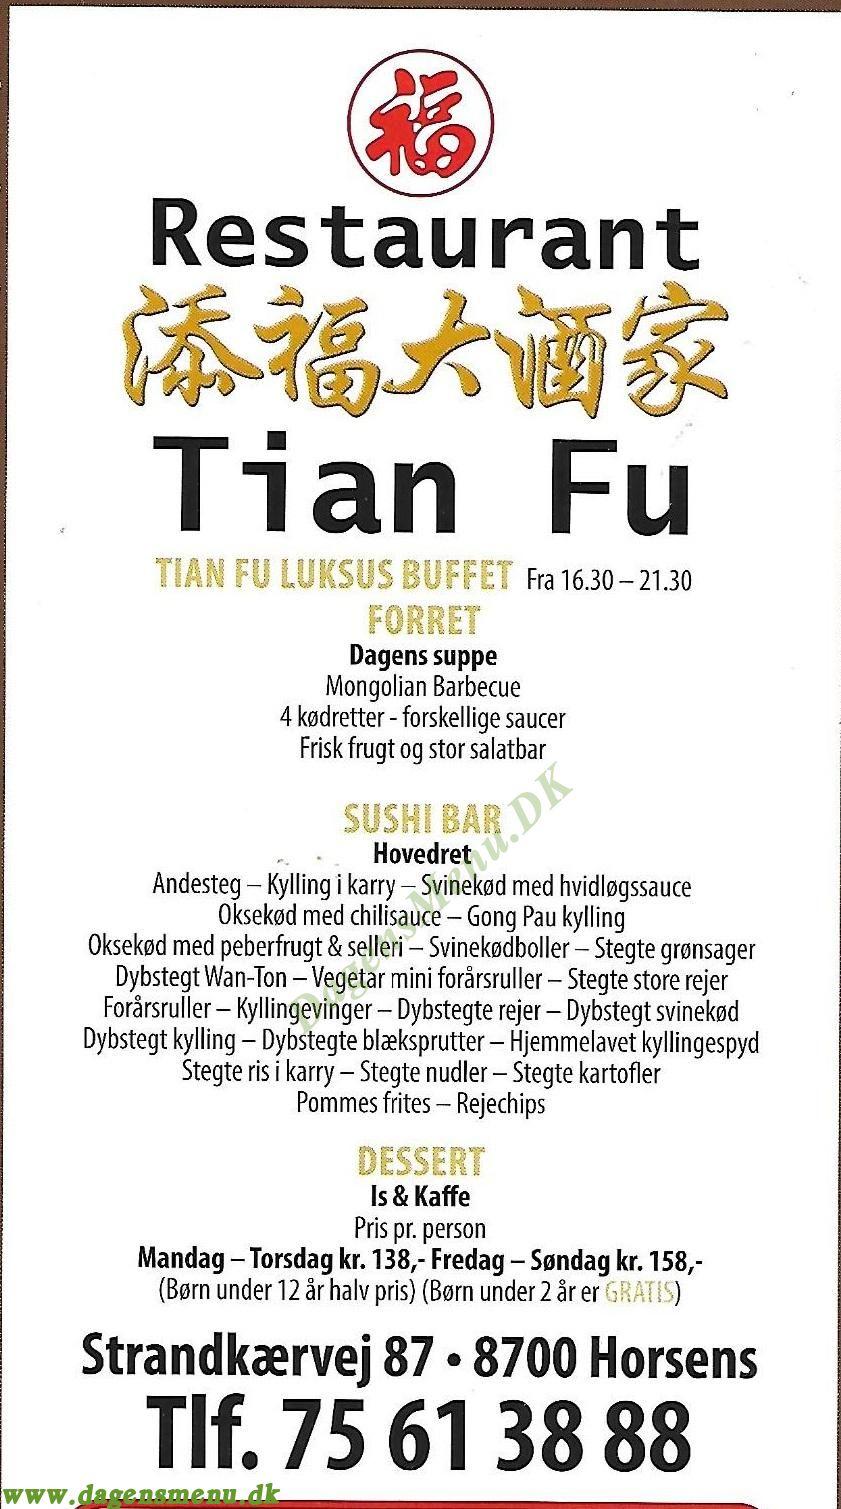 Restaurant Tian Fu - Menukort